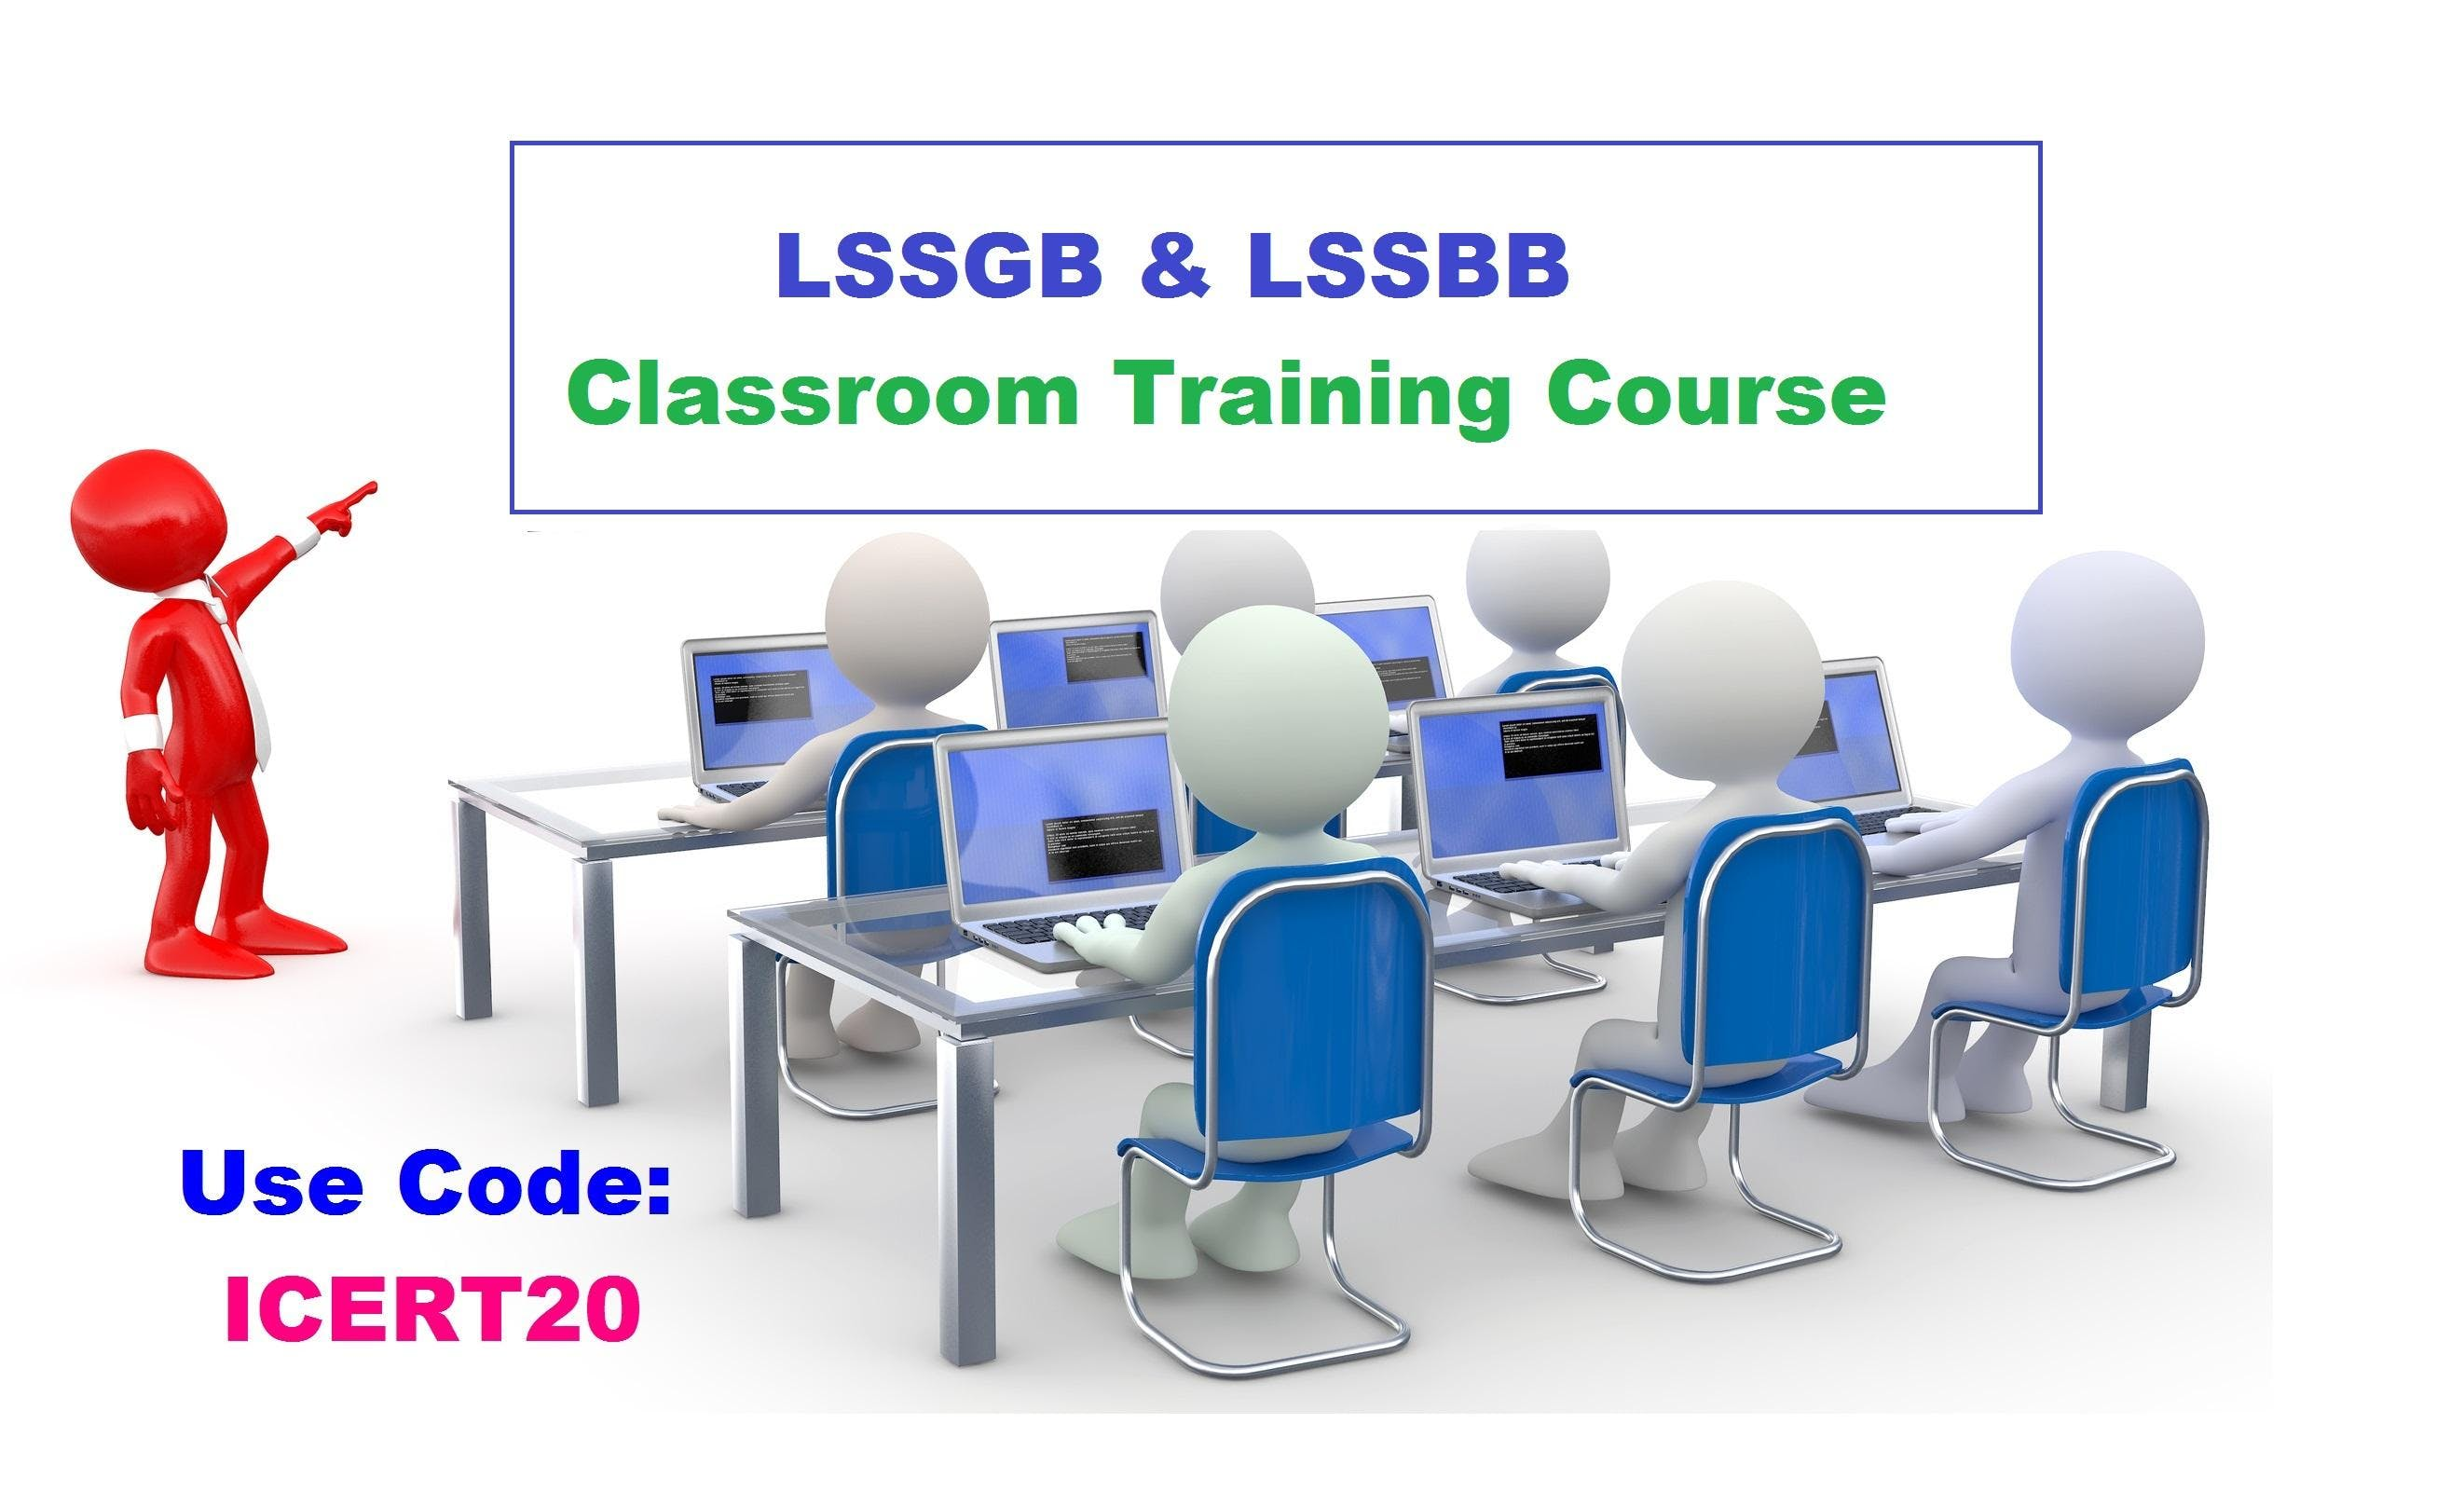 Lssgb And Lssbb Classroom Training In Miami Gardens Fl 26 Feb 2019